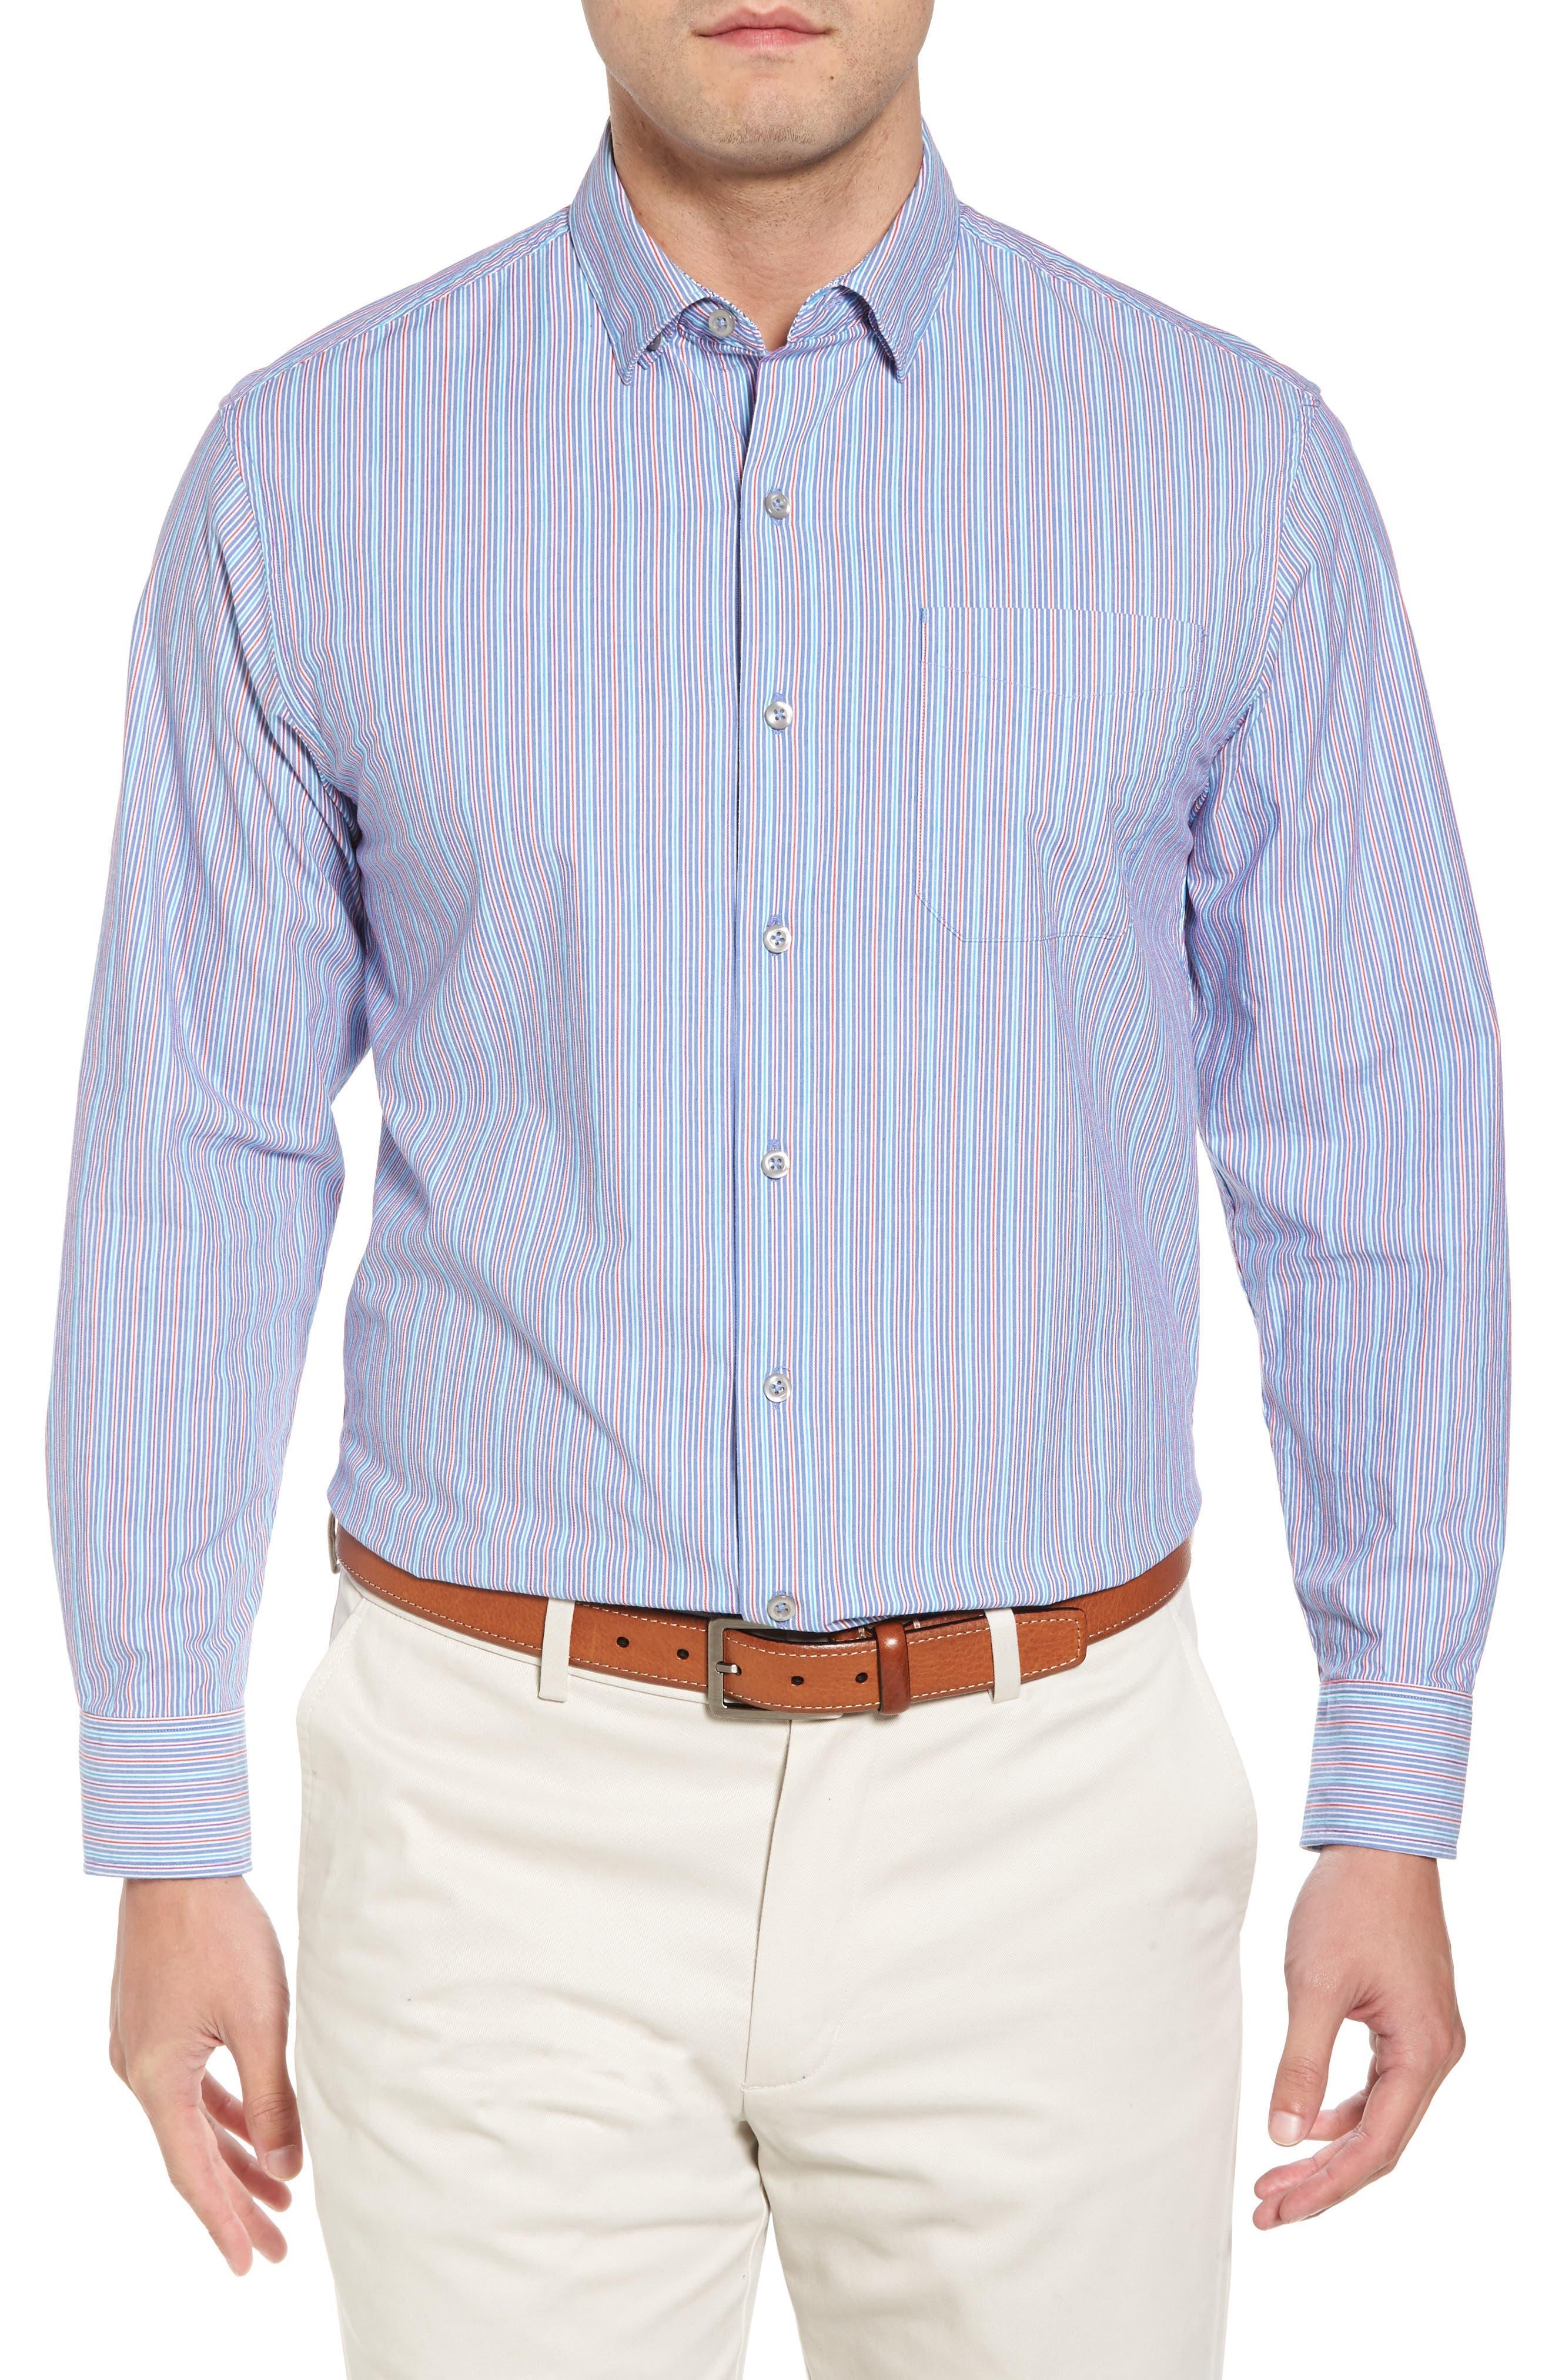 Tallahassee Cotton & Silk Blend Sport Shirt,                             Main thumbnail 1, color,                             Cobalt Sea